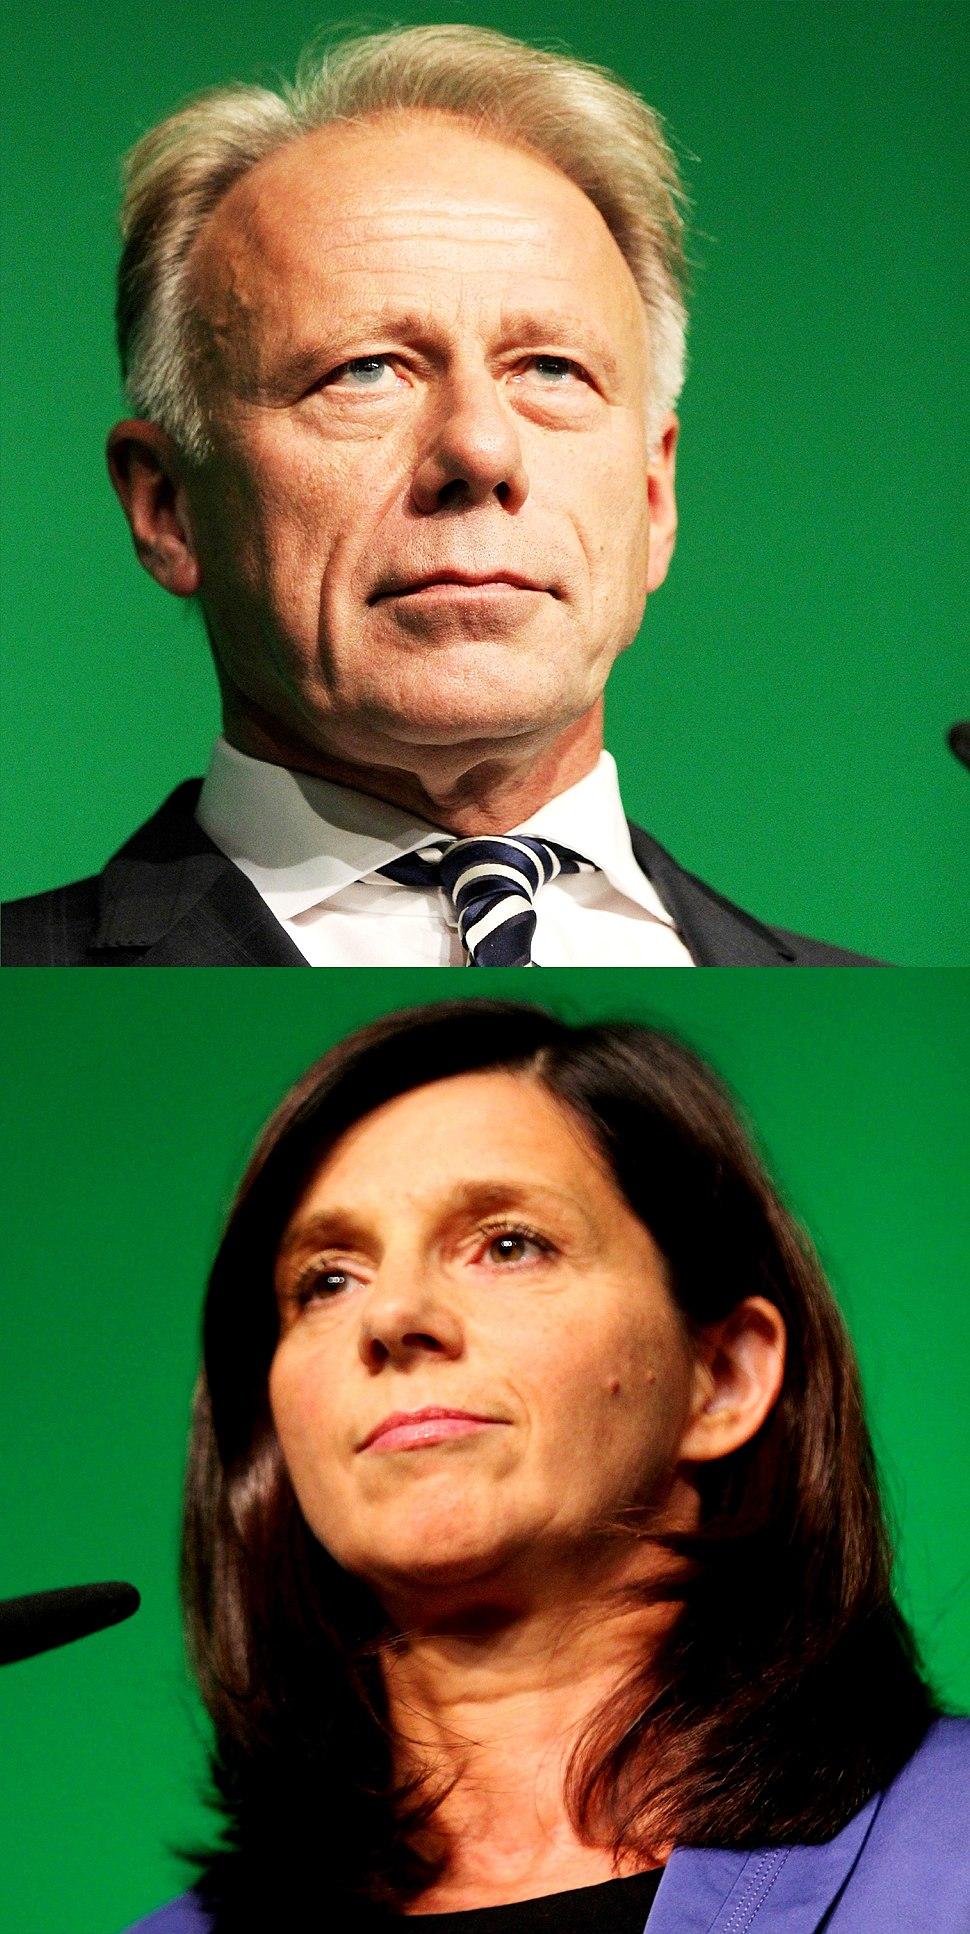 Jürgen Trittin y Katrin Göring-Eckardt 2013